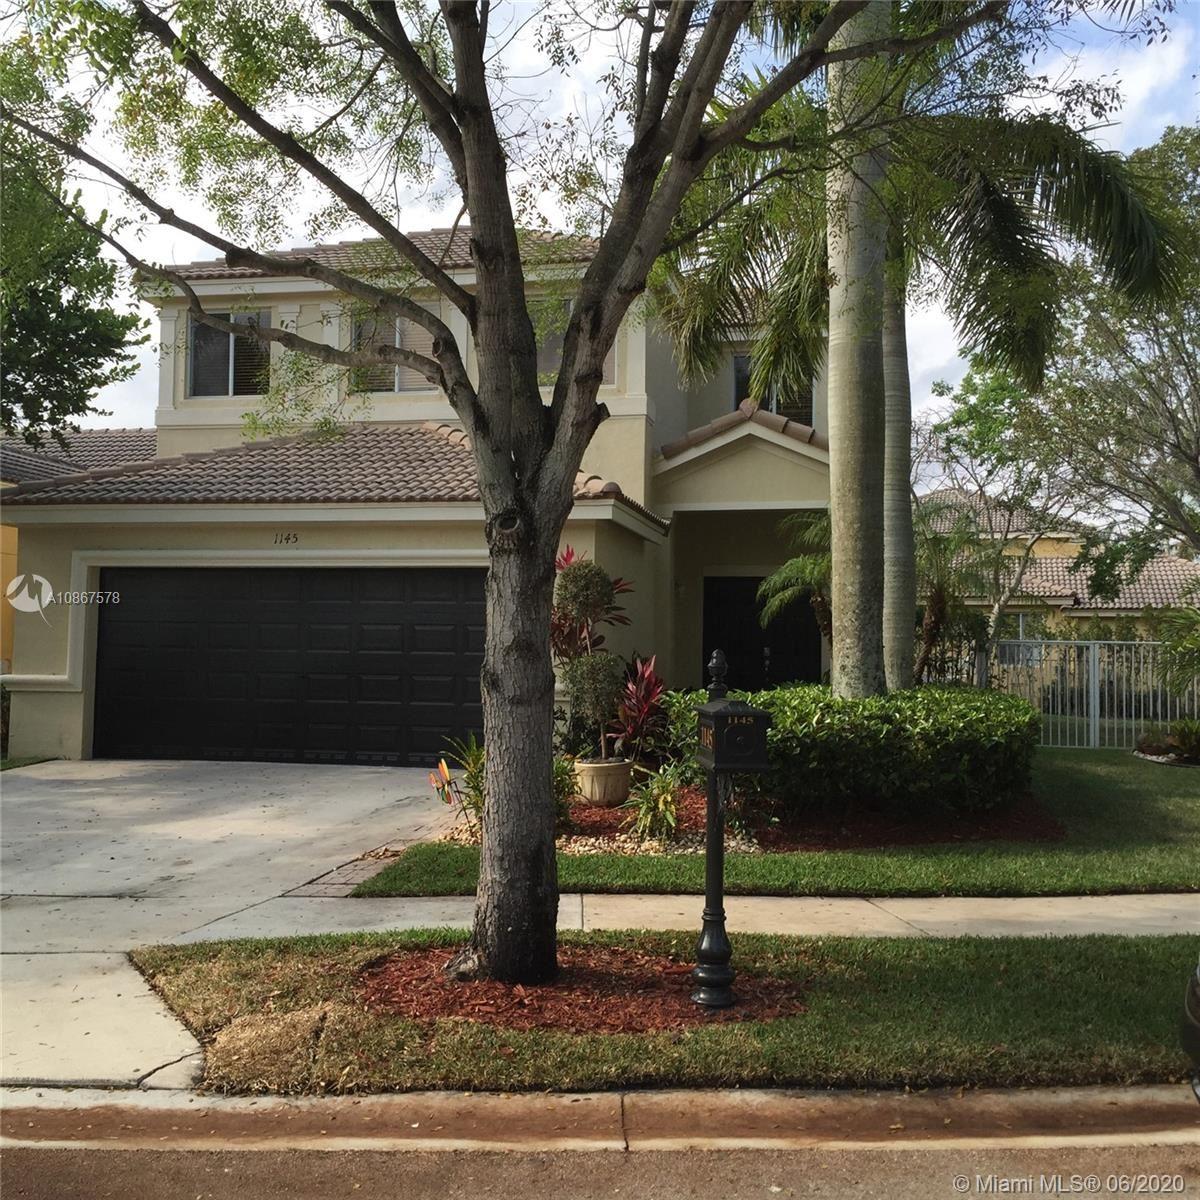 1145 Golden Cane Dr, Weston, FL 33327 - #: A10867578